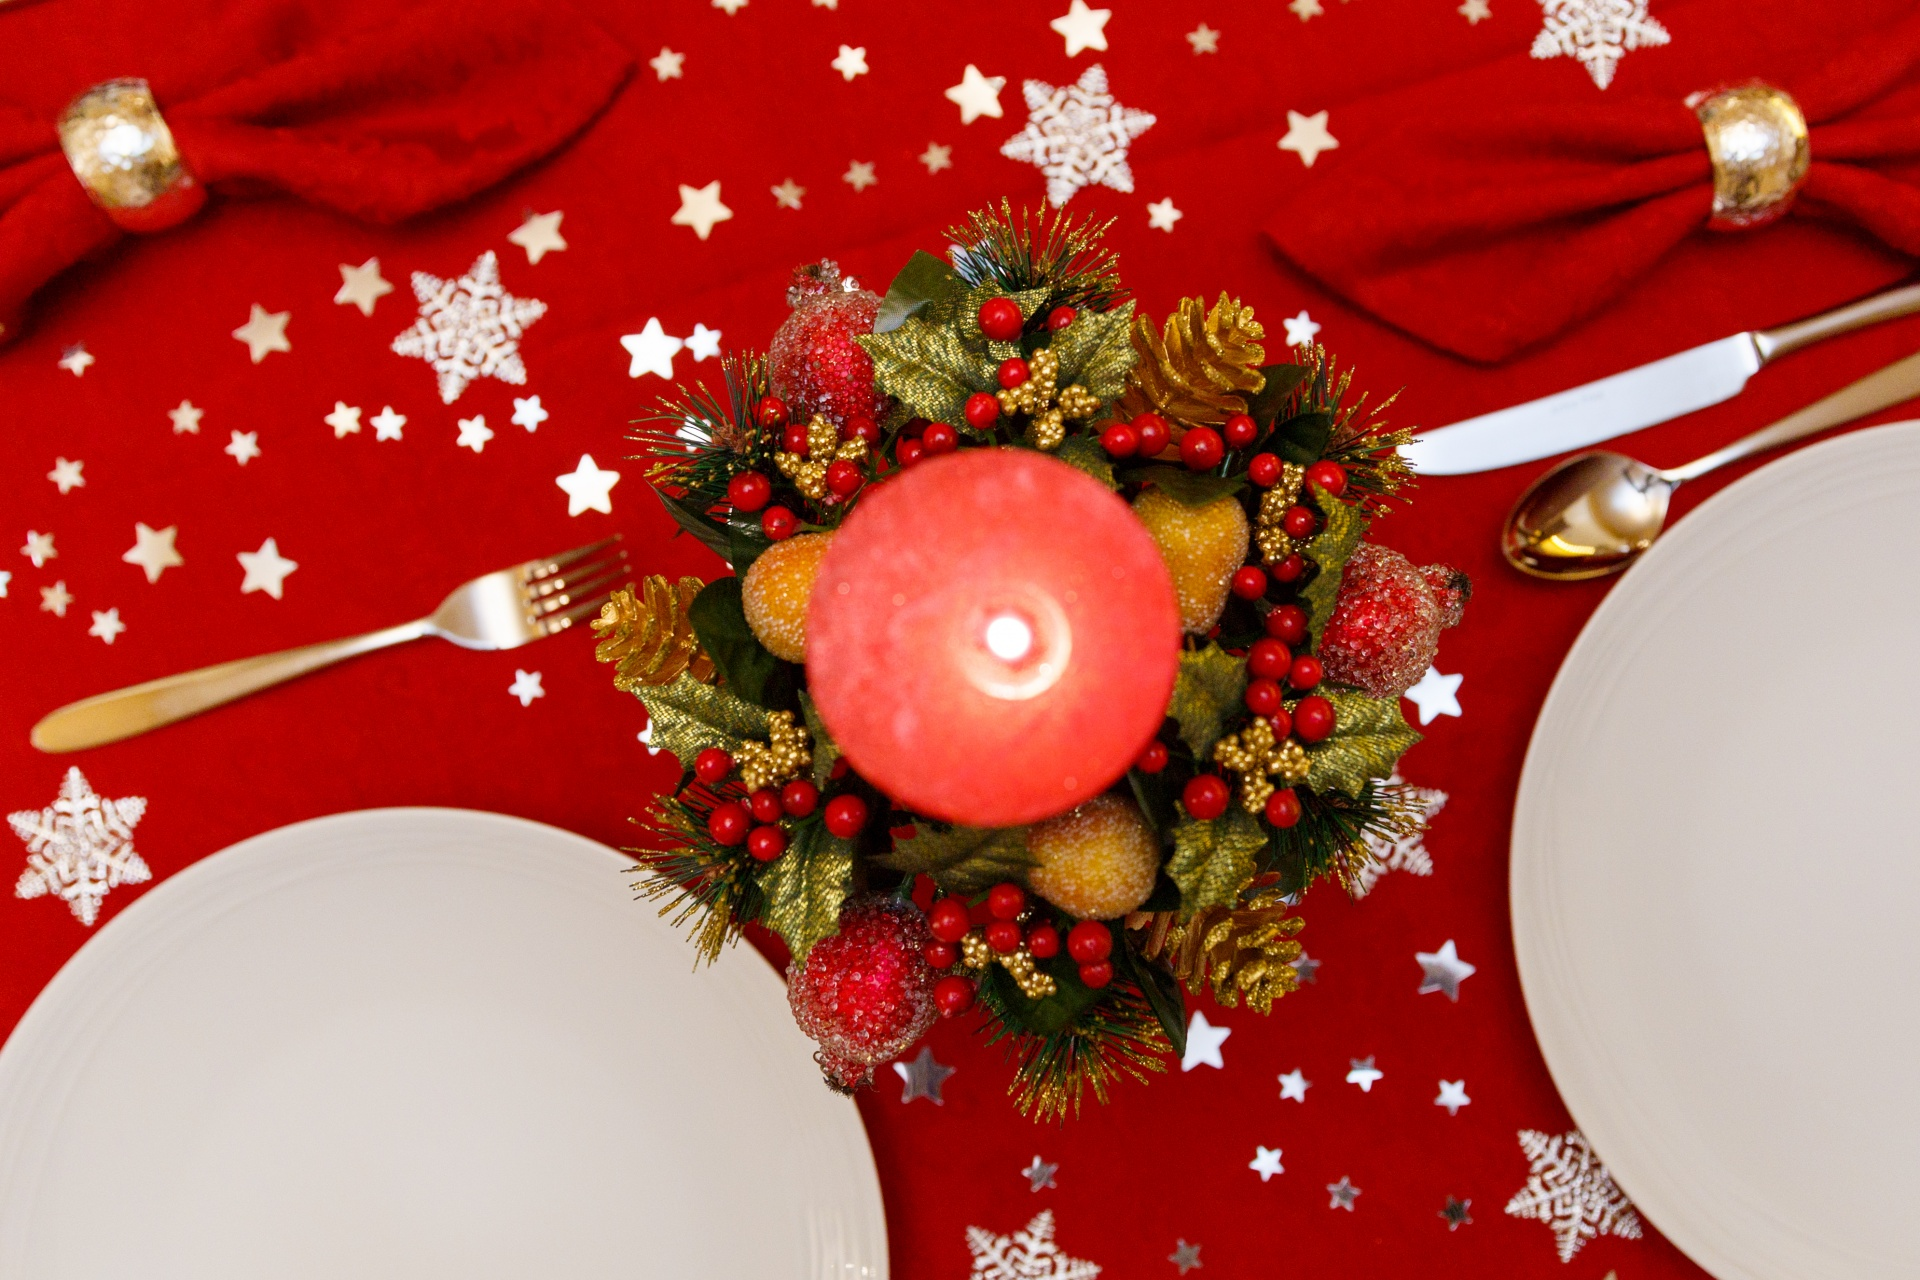 Christmas Dinner Table Free Stock Photo Public Domain